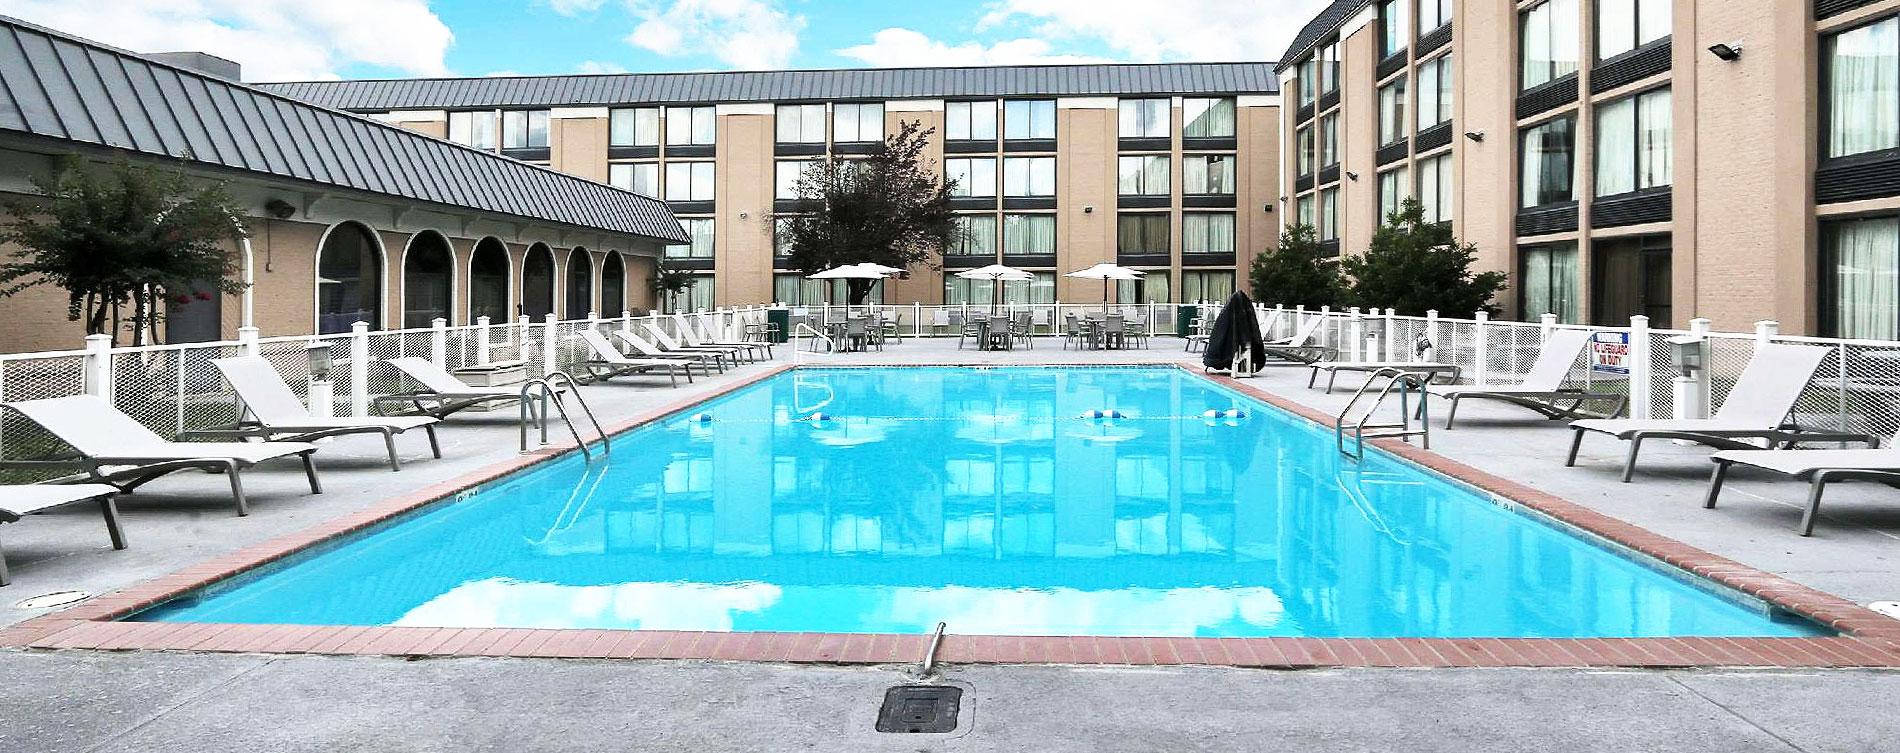 American Resort Management, Pennsylvania